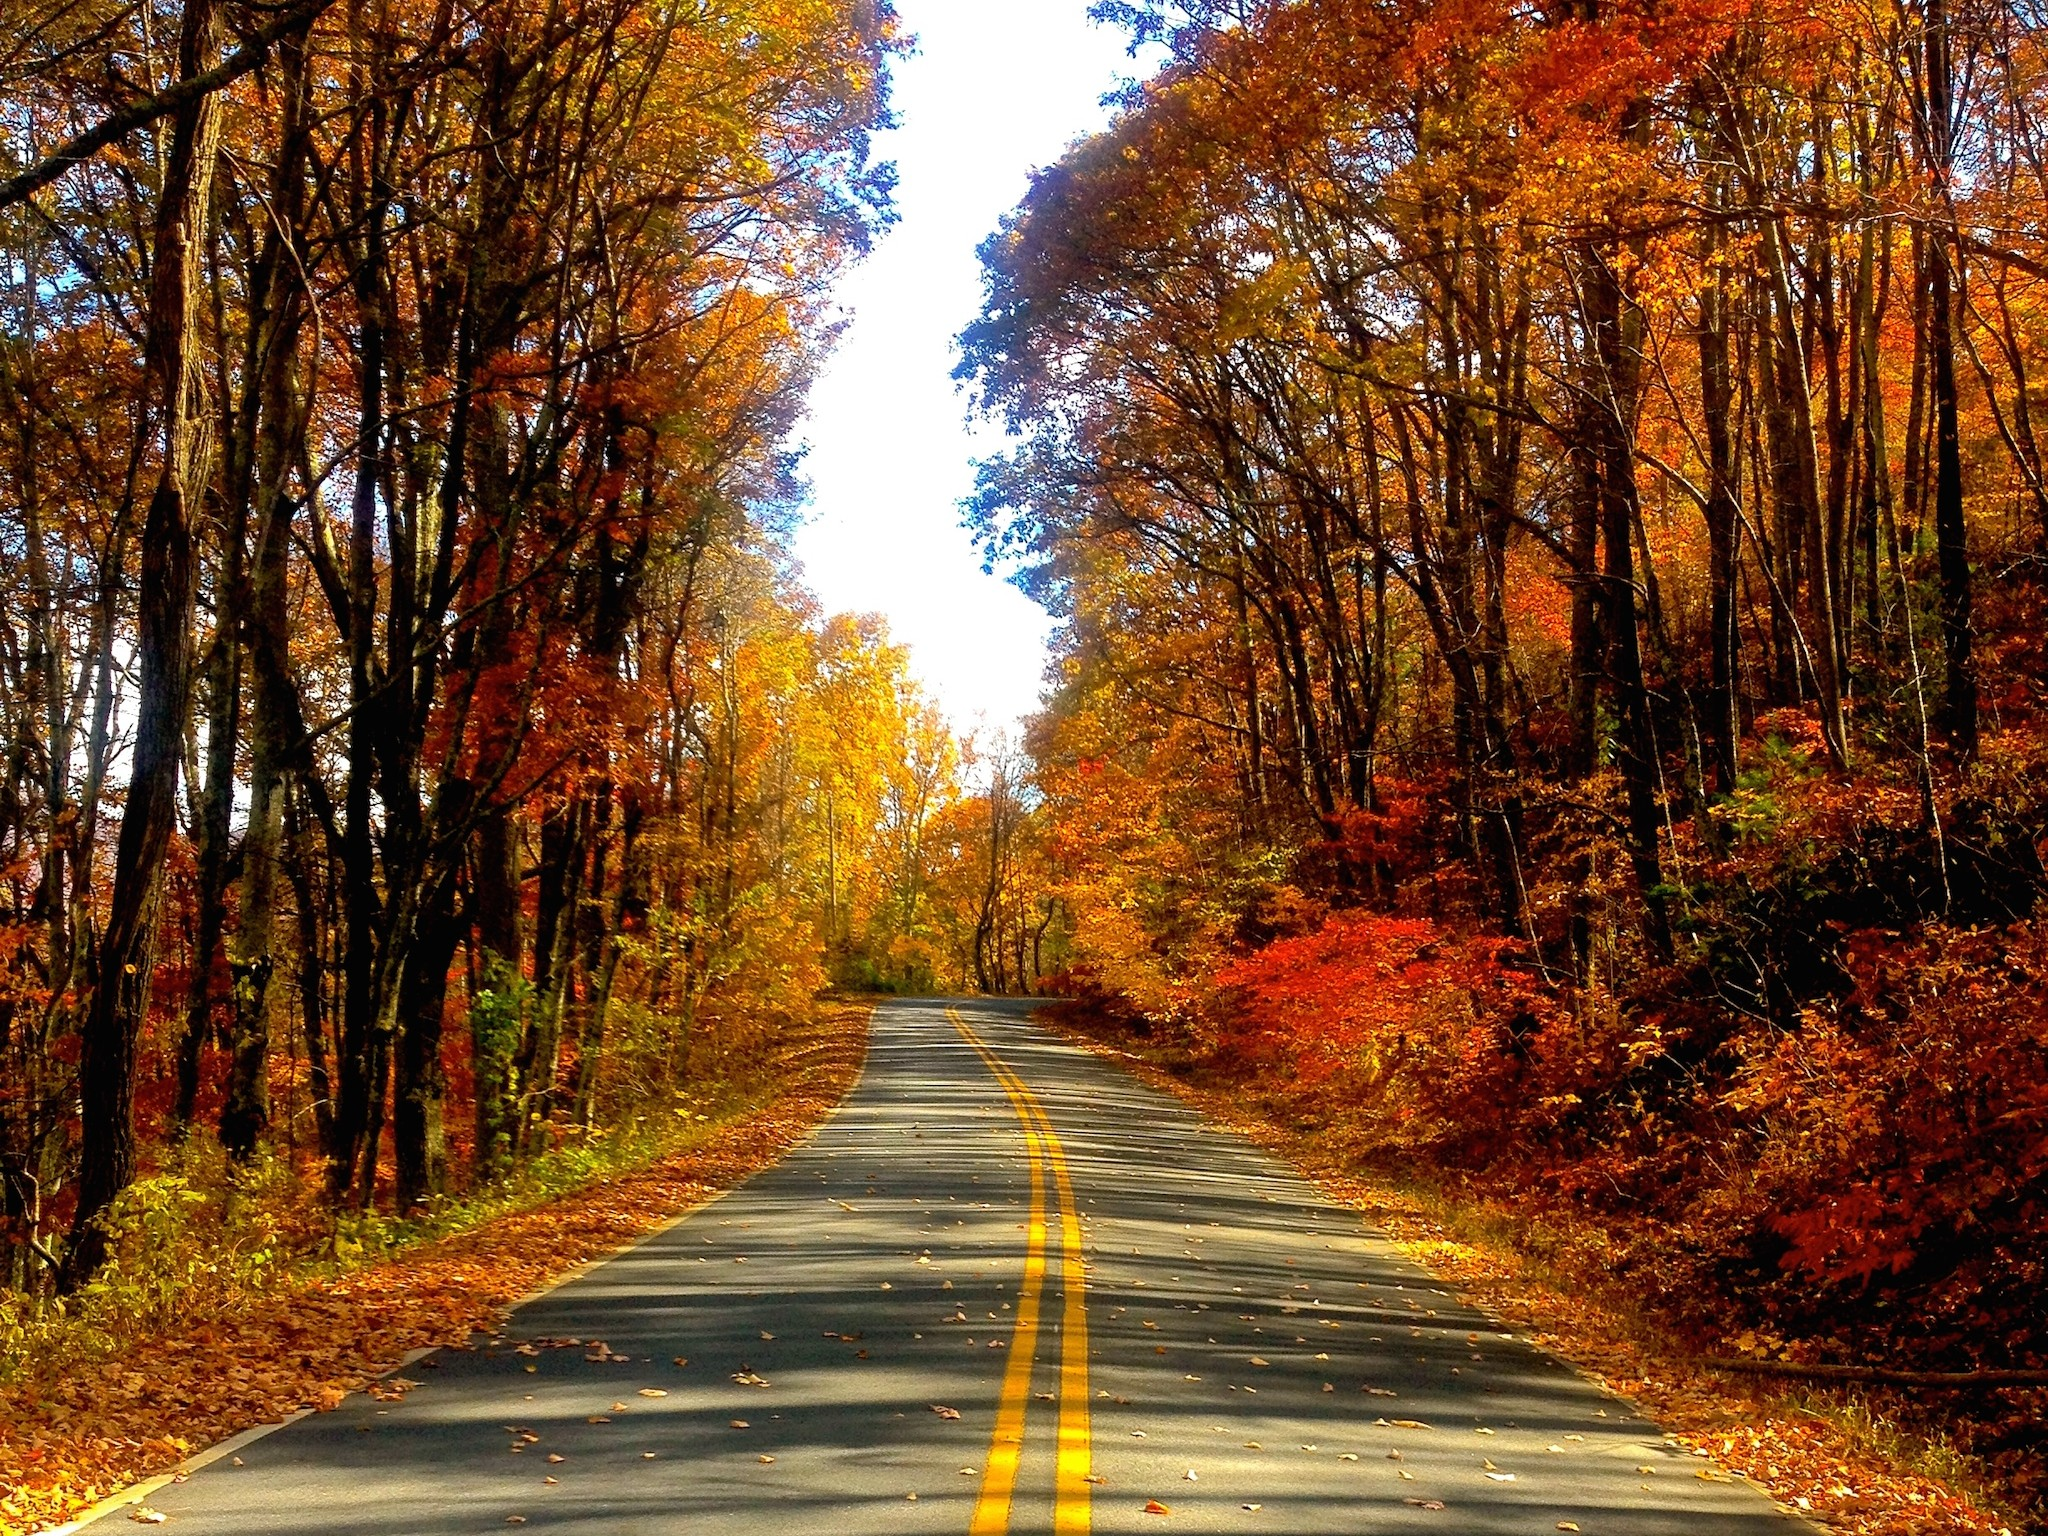 Free Fall Desktop Wallpaper For Mac Autumn Road Hd Wallpaper Free Autumn Downloads